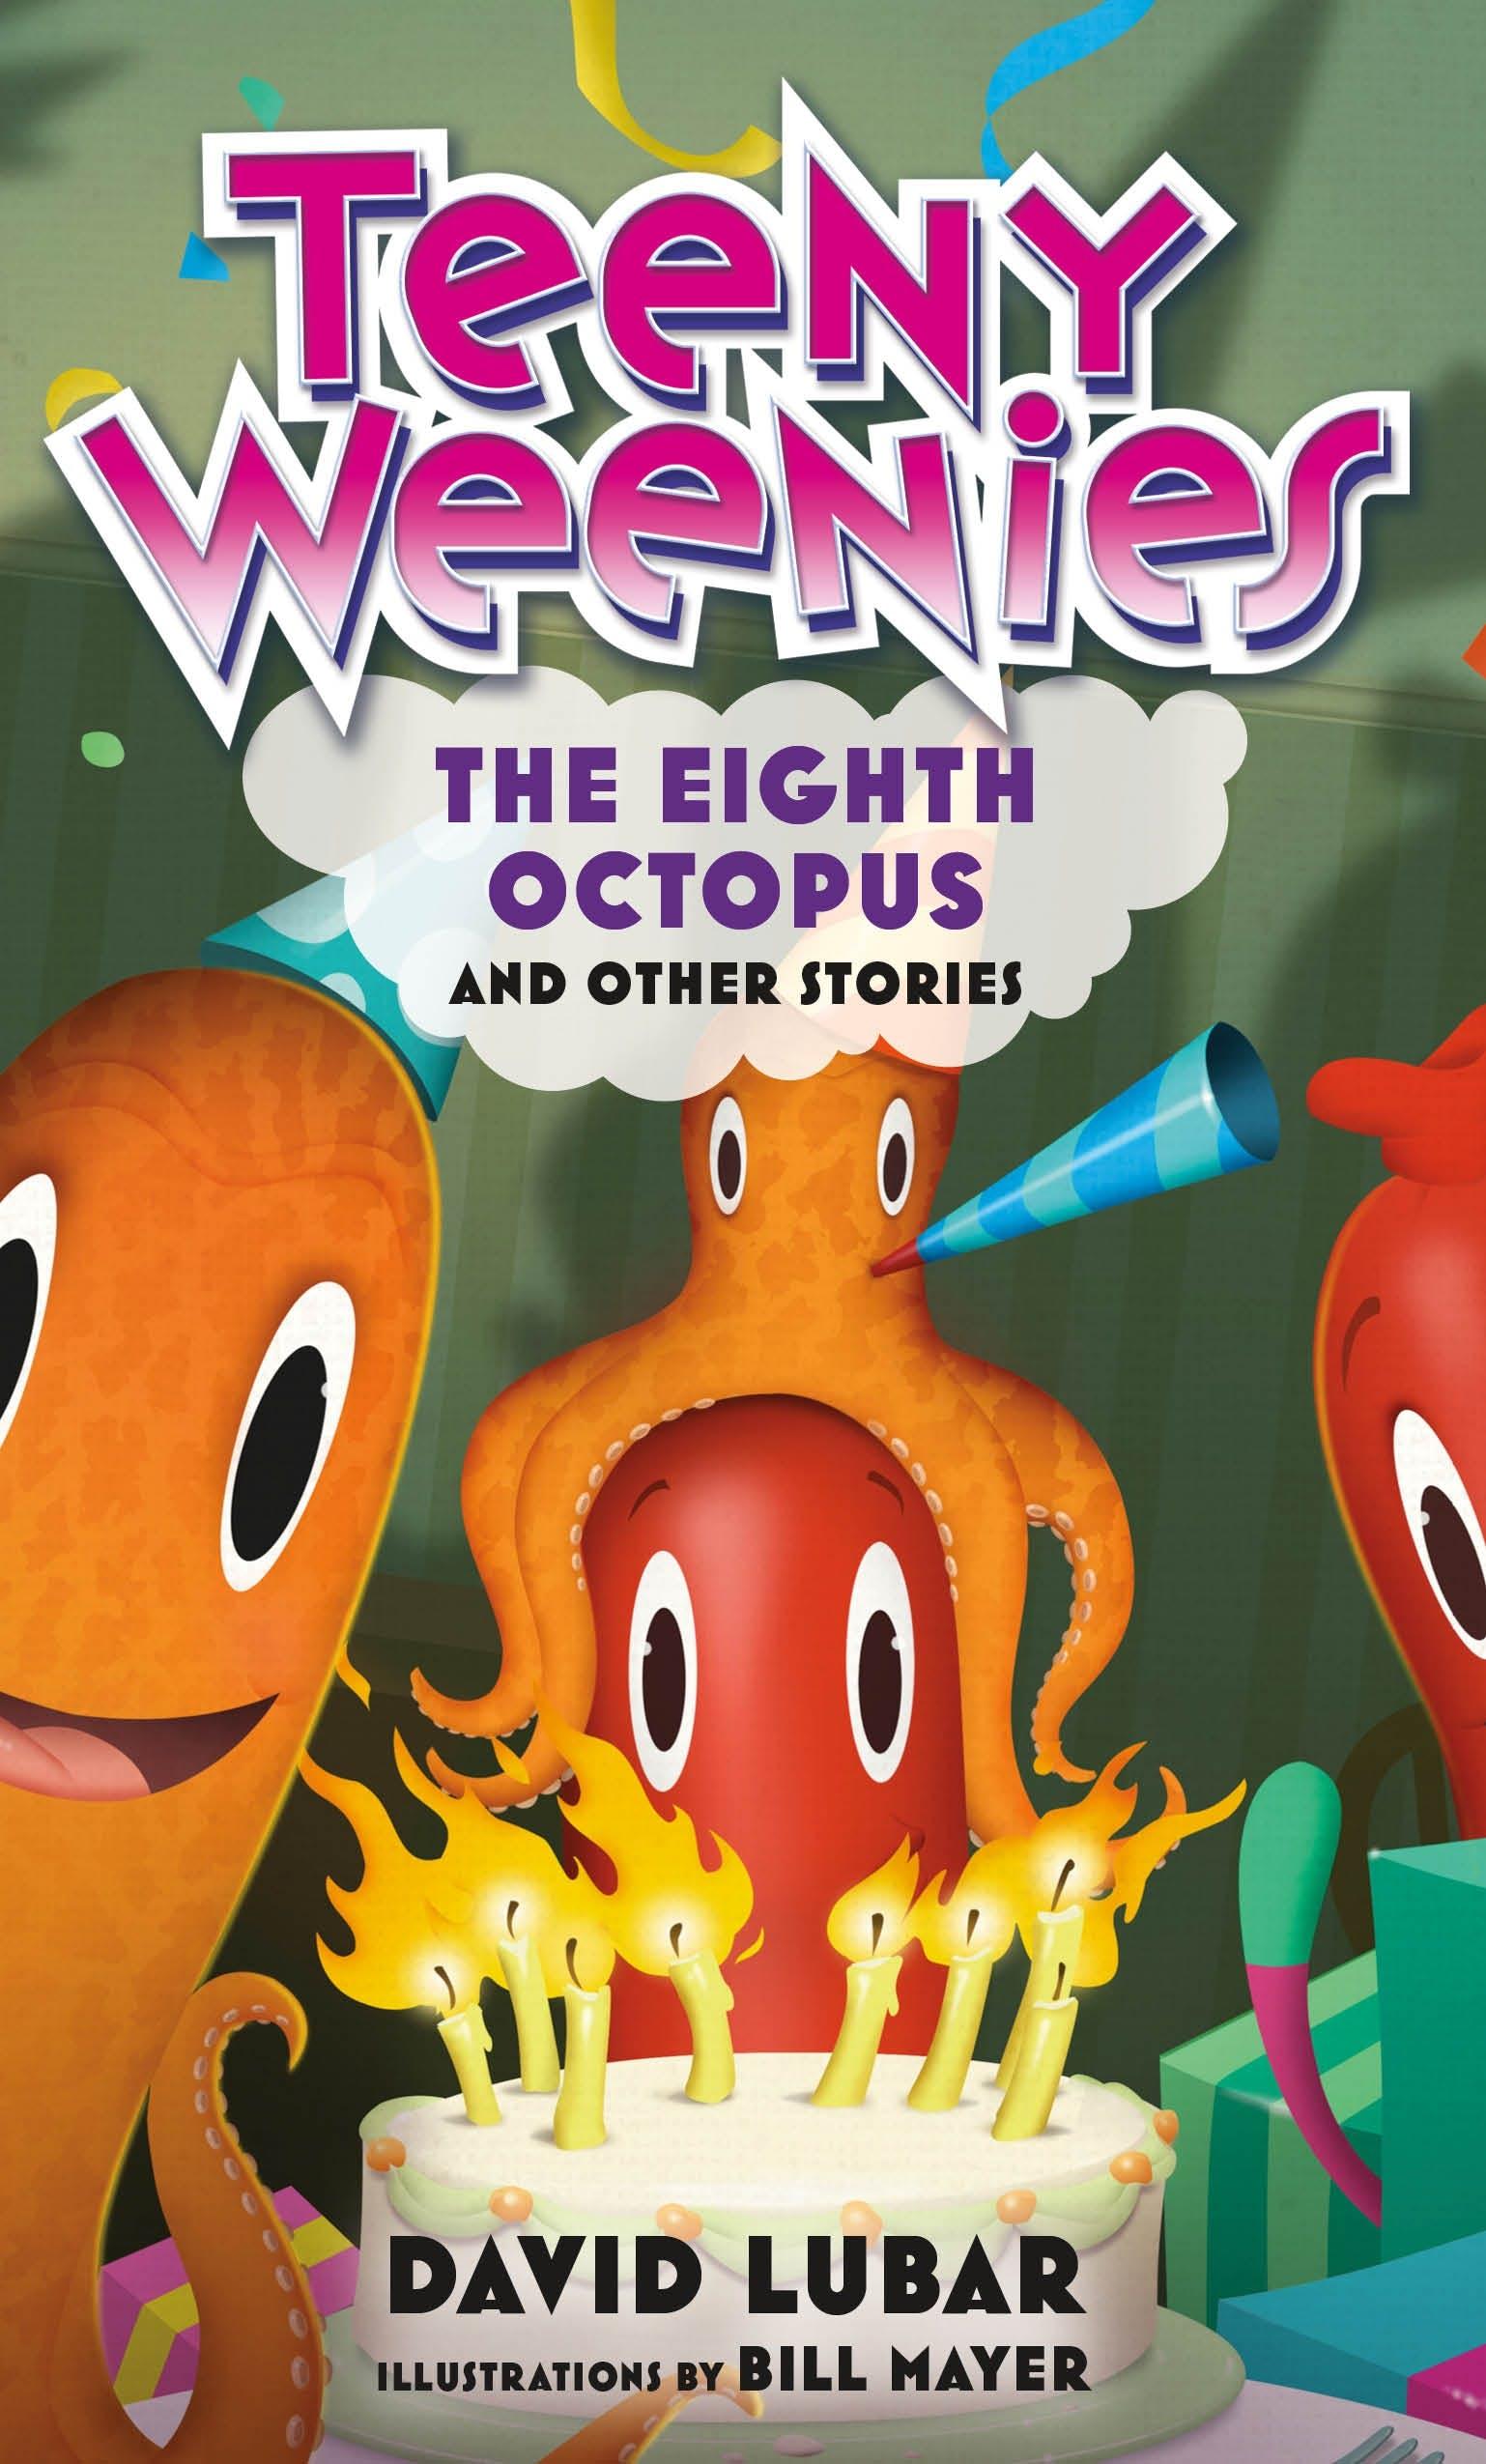 Image of Teeny Weenies: The Eighth Octopus